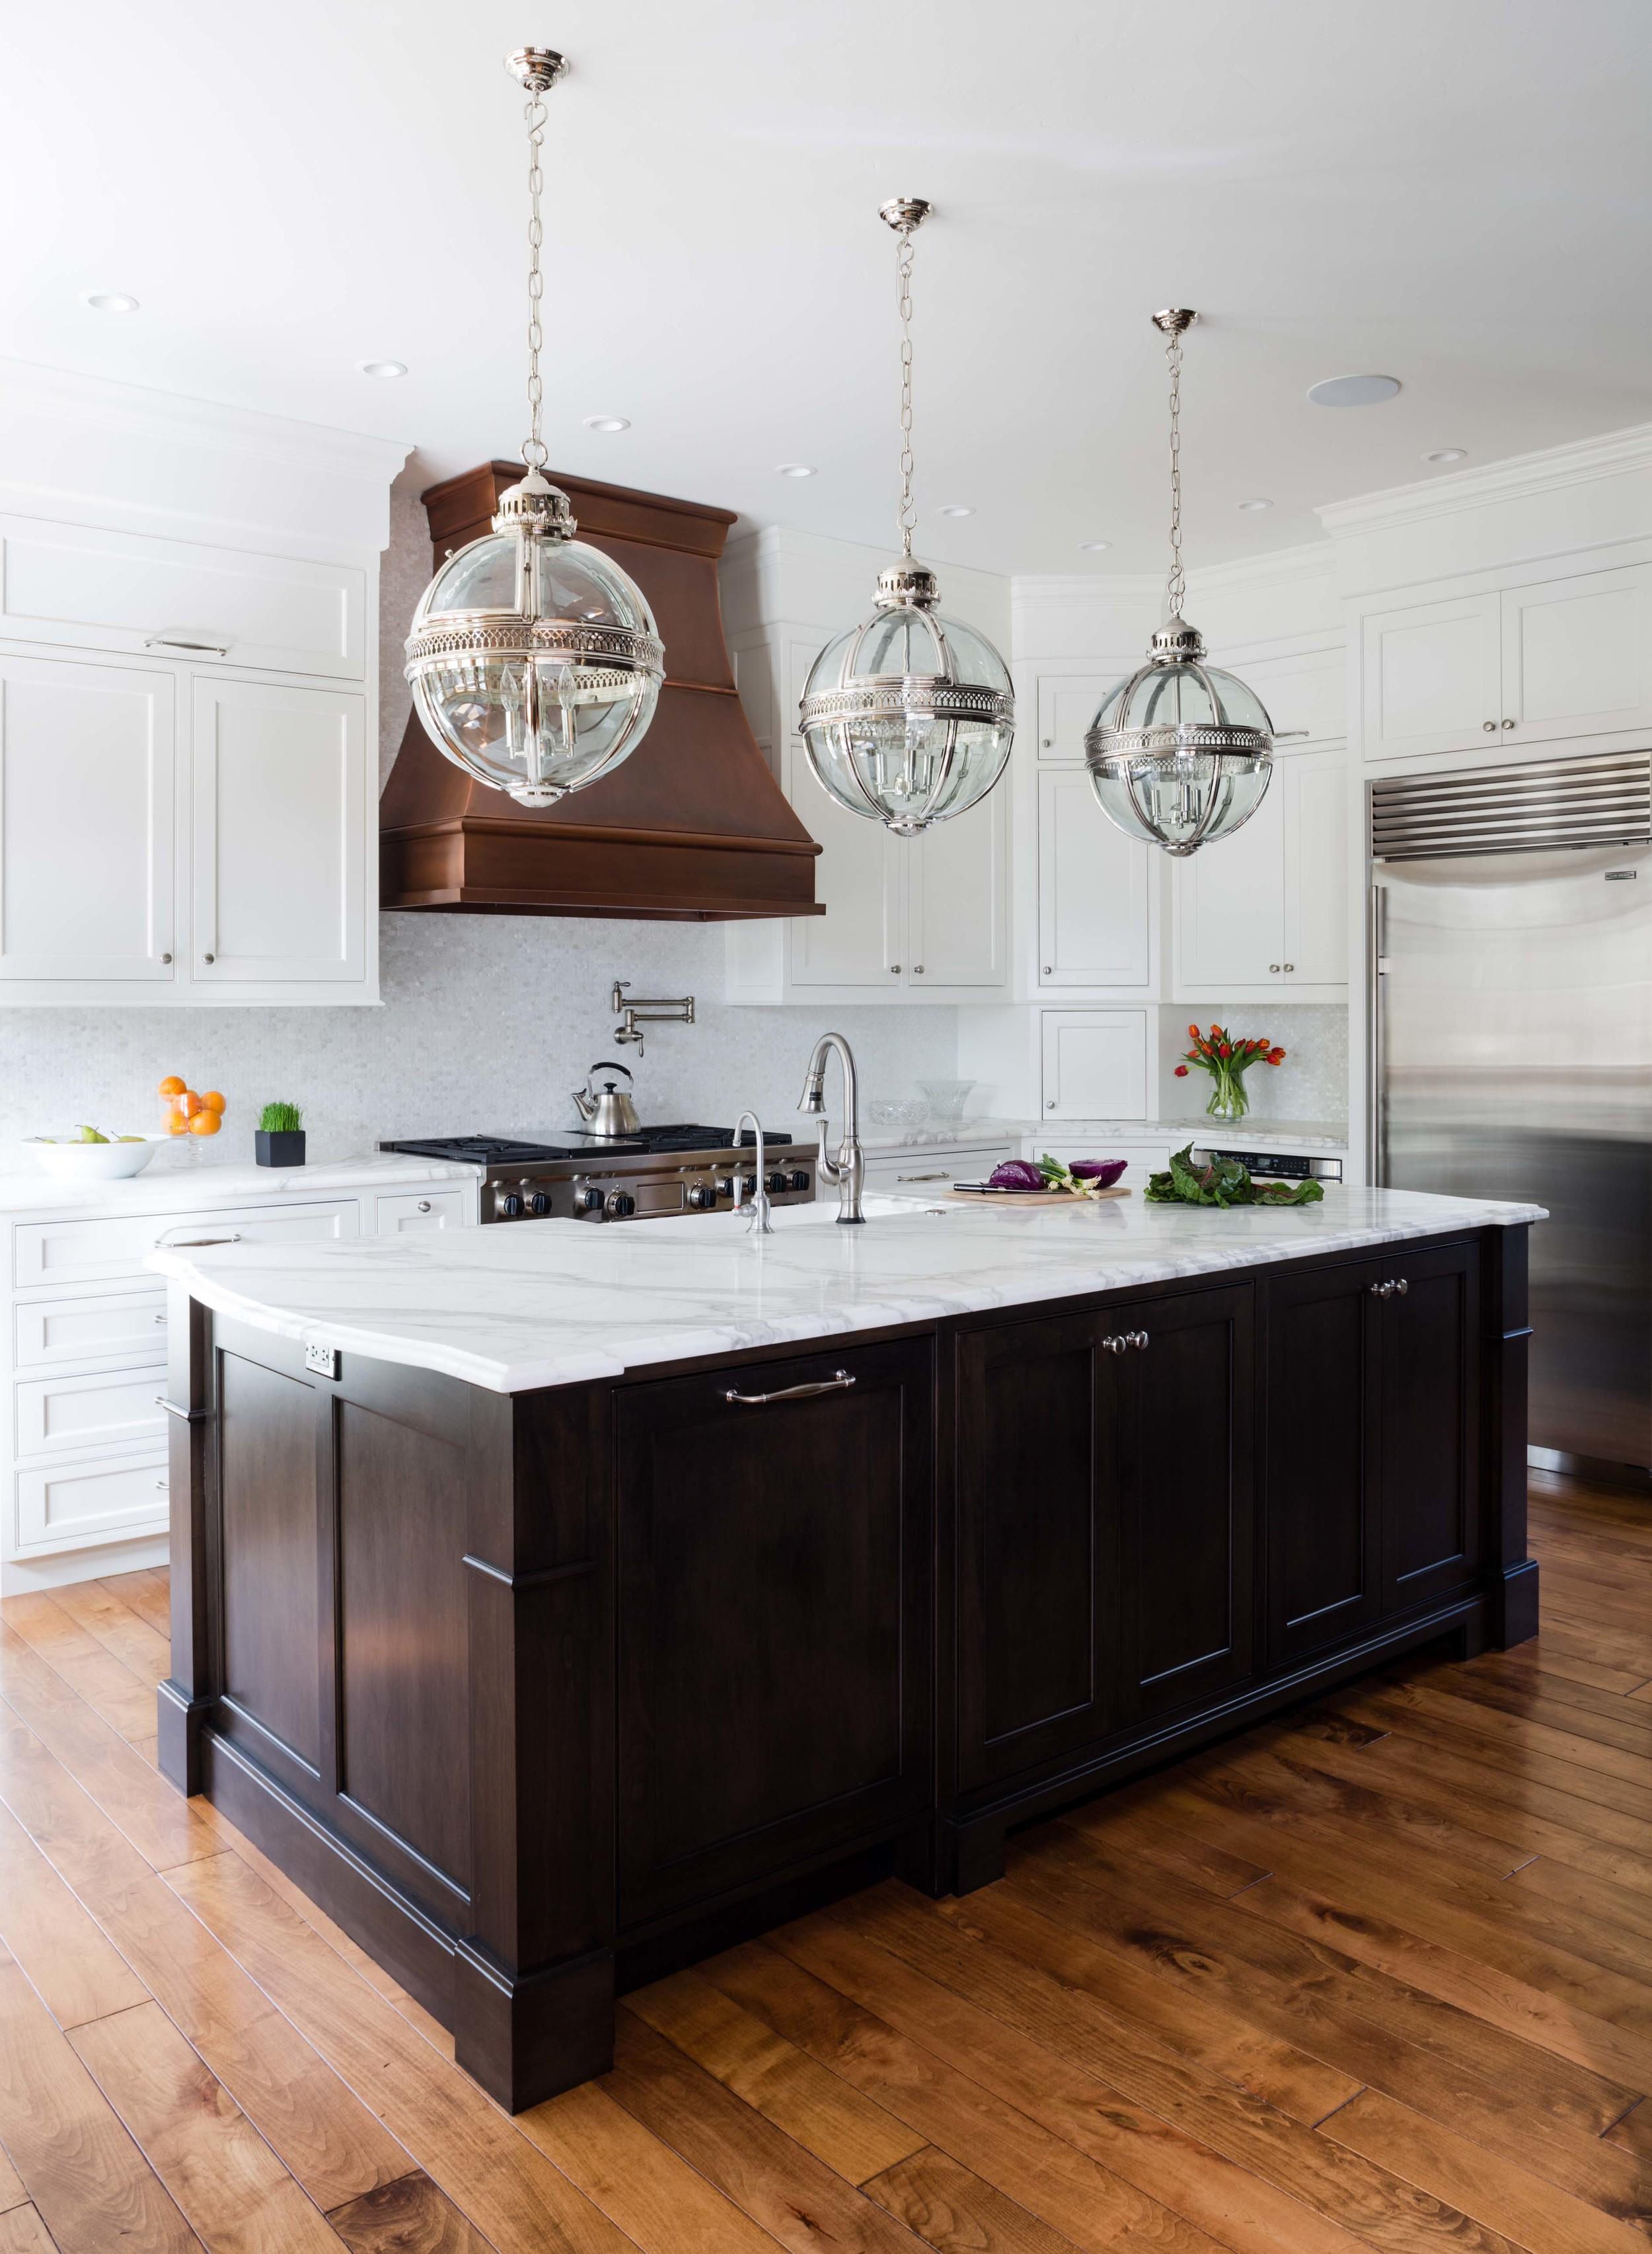 Maven_Crosswater_kitchen_2.jpg